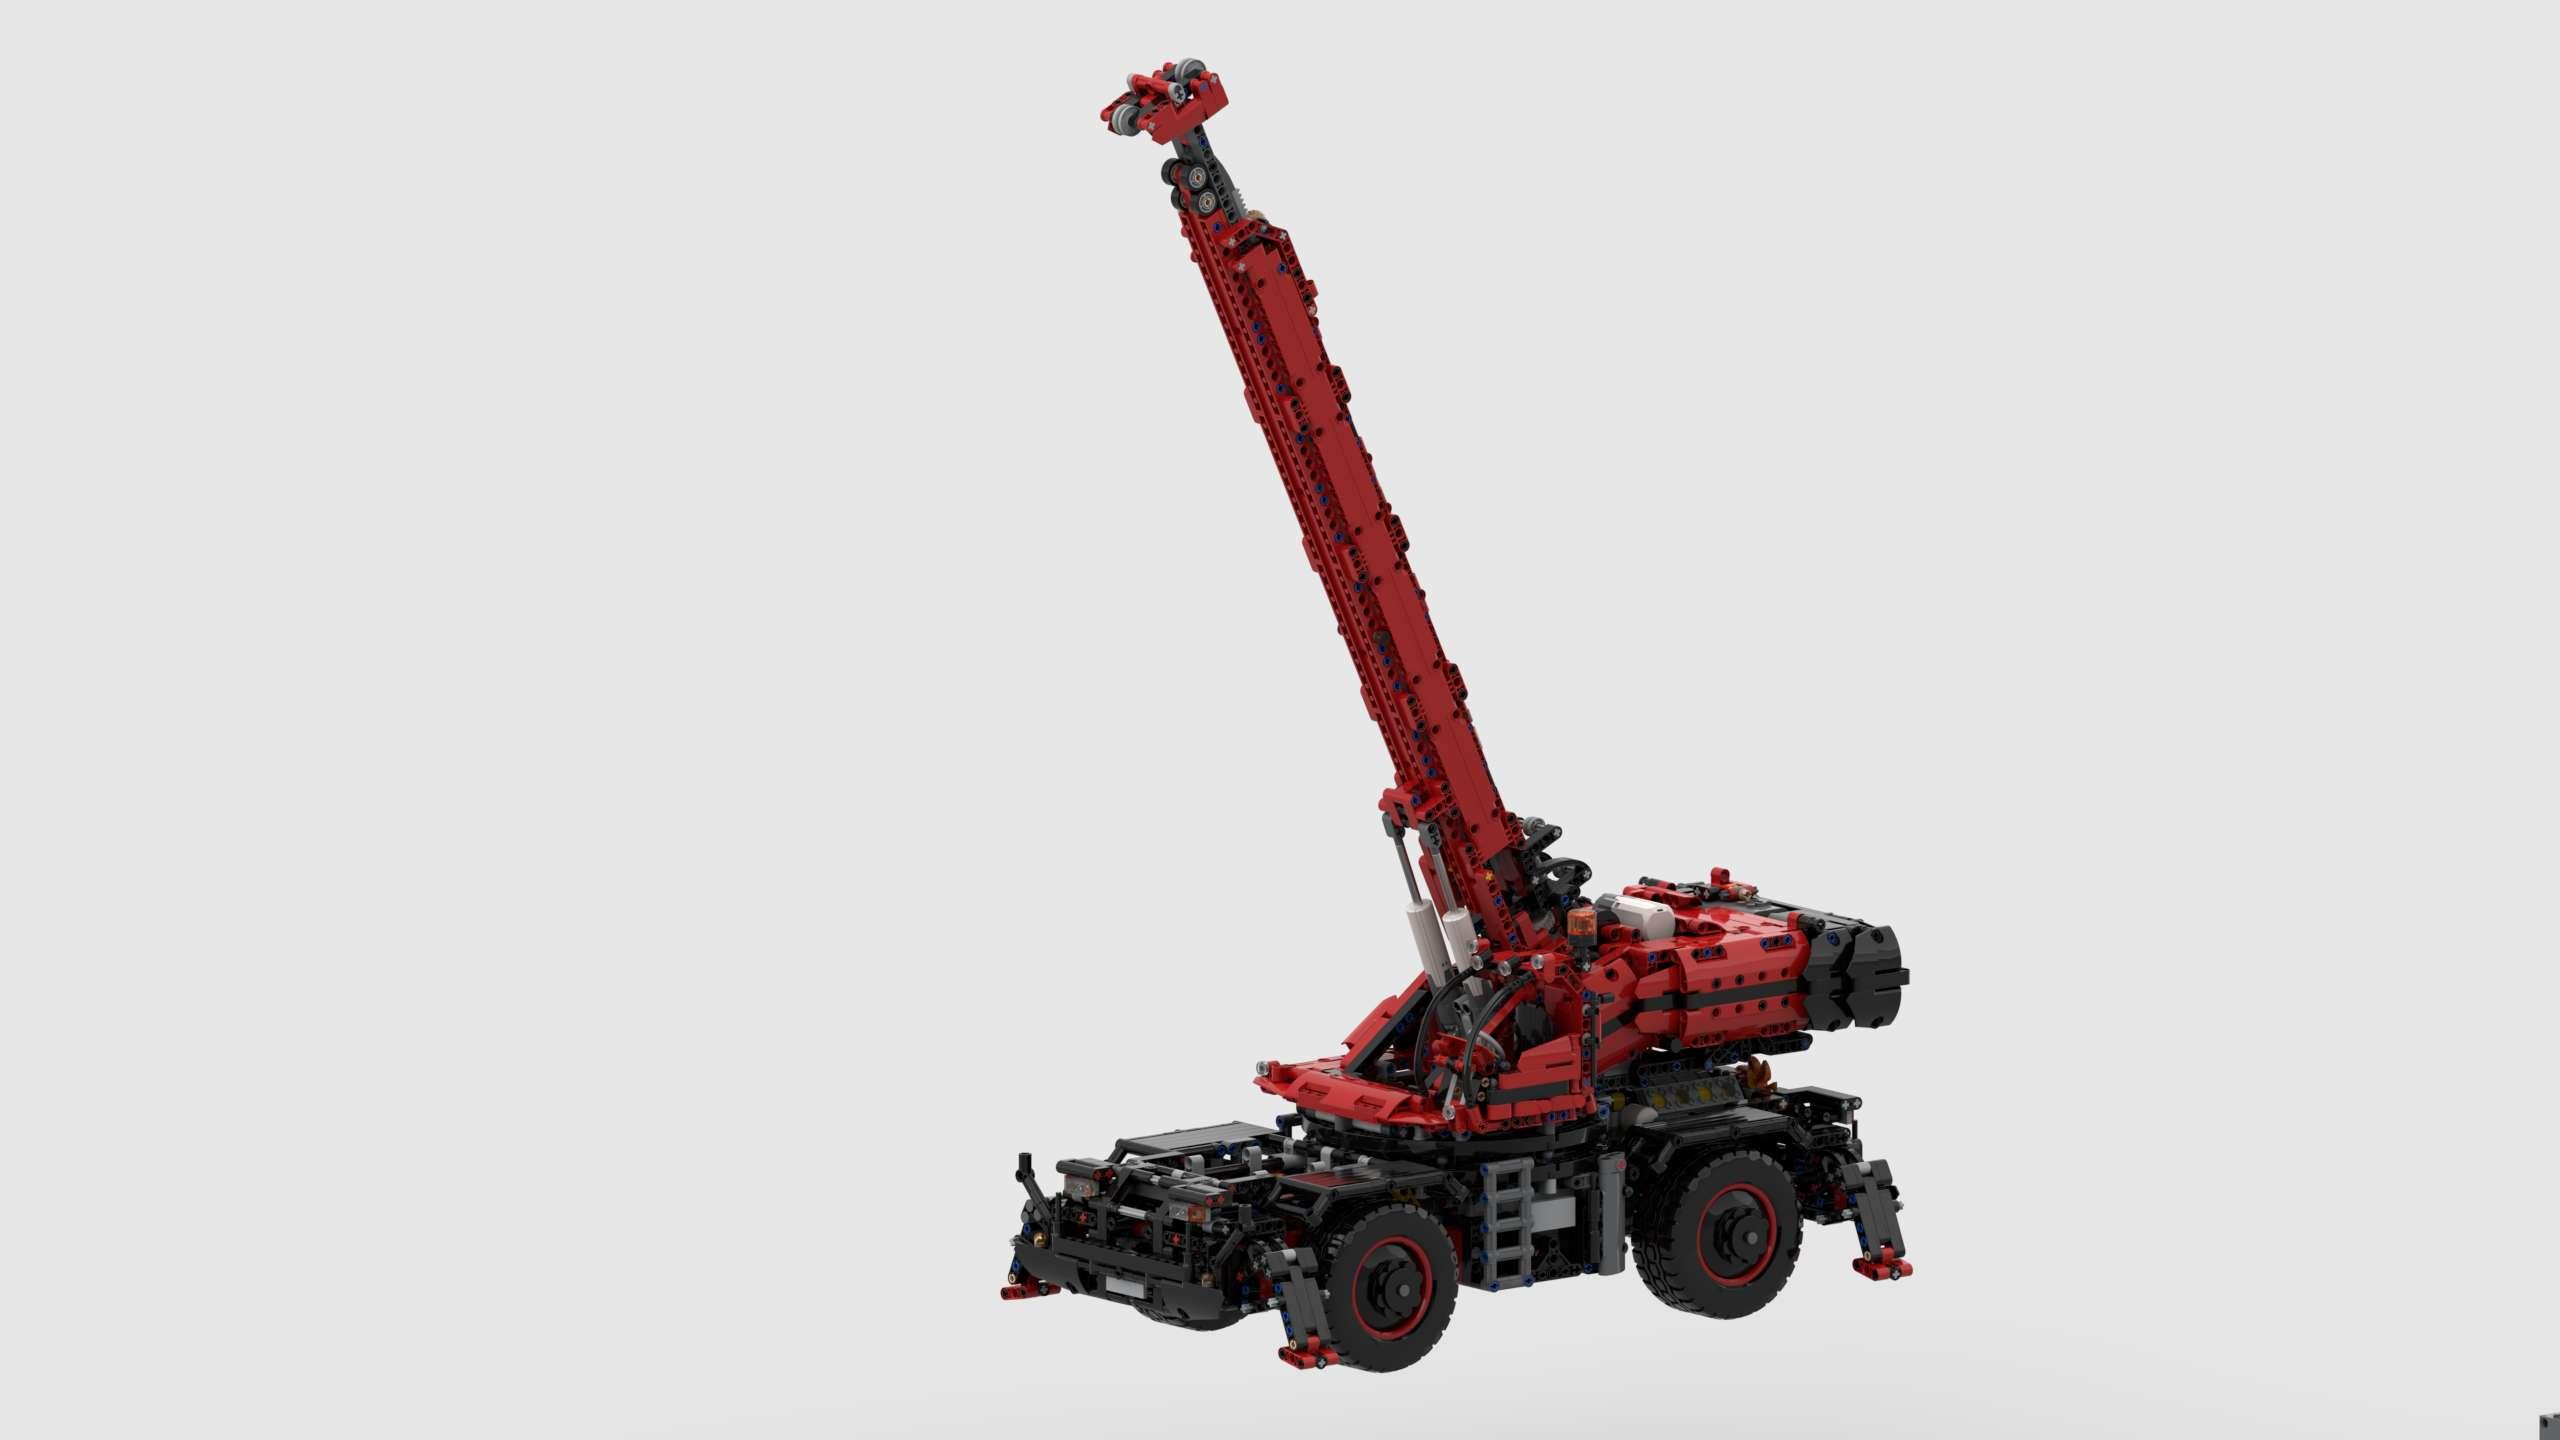 http://mistercreator.de/produkt/lego-42082-rc-umbau/